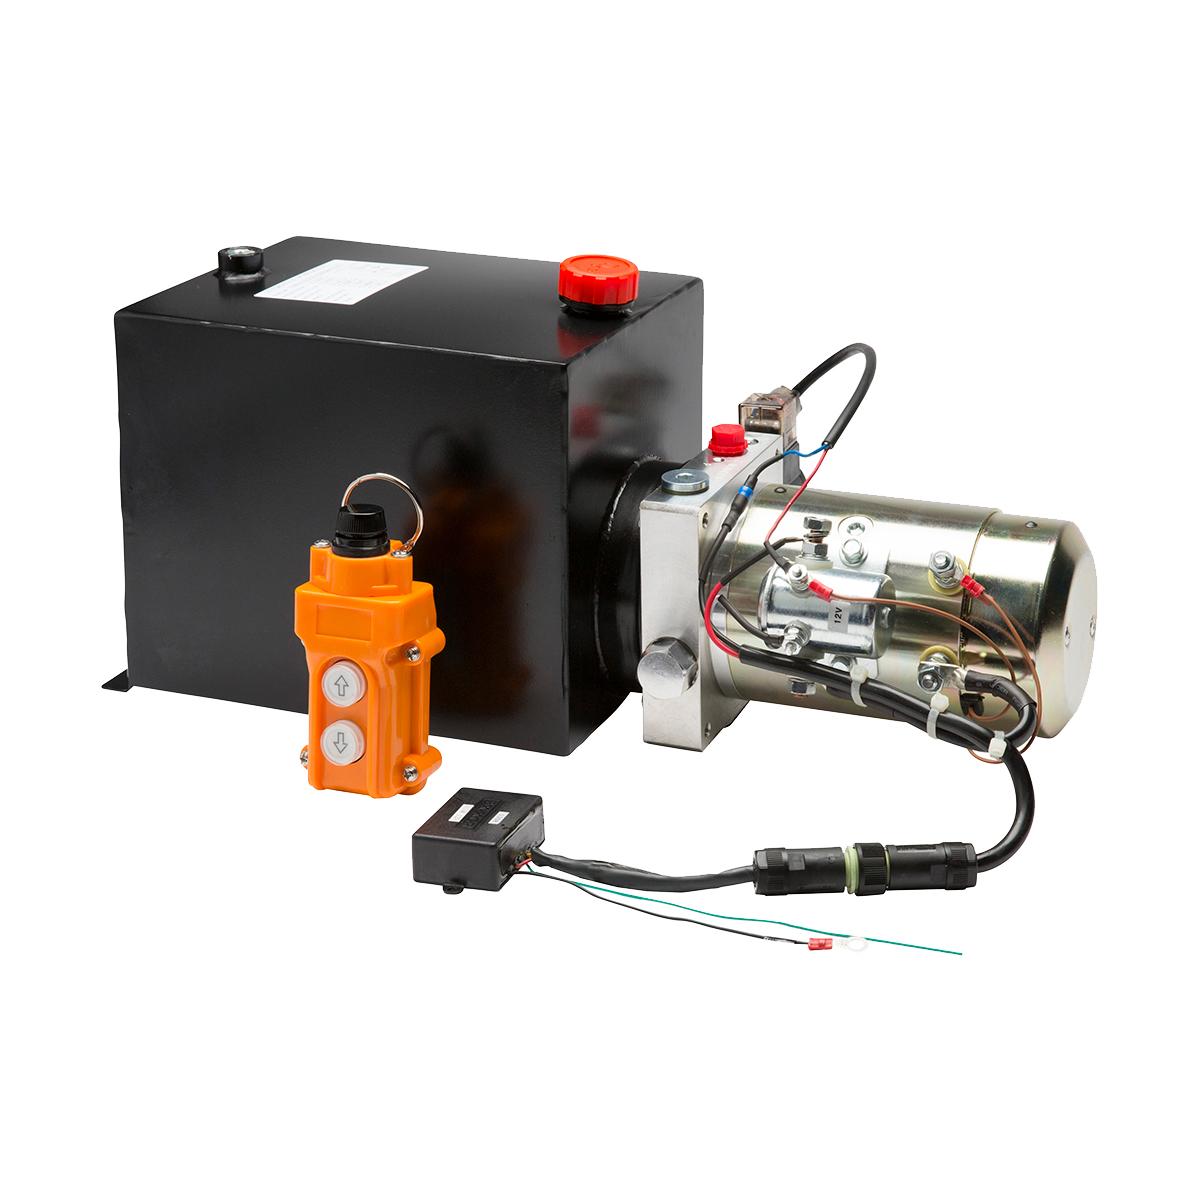 Tipper Hydraulic Power Pack - Gold 12V 10L